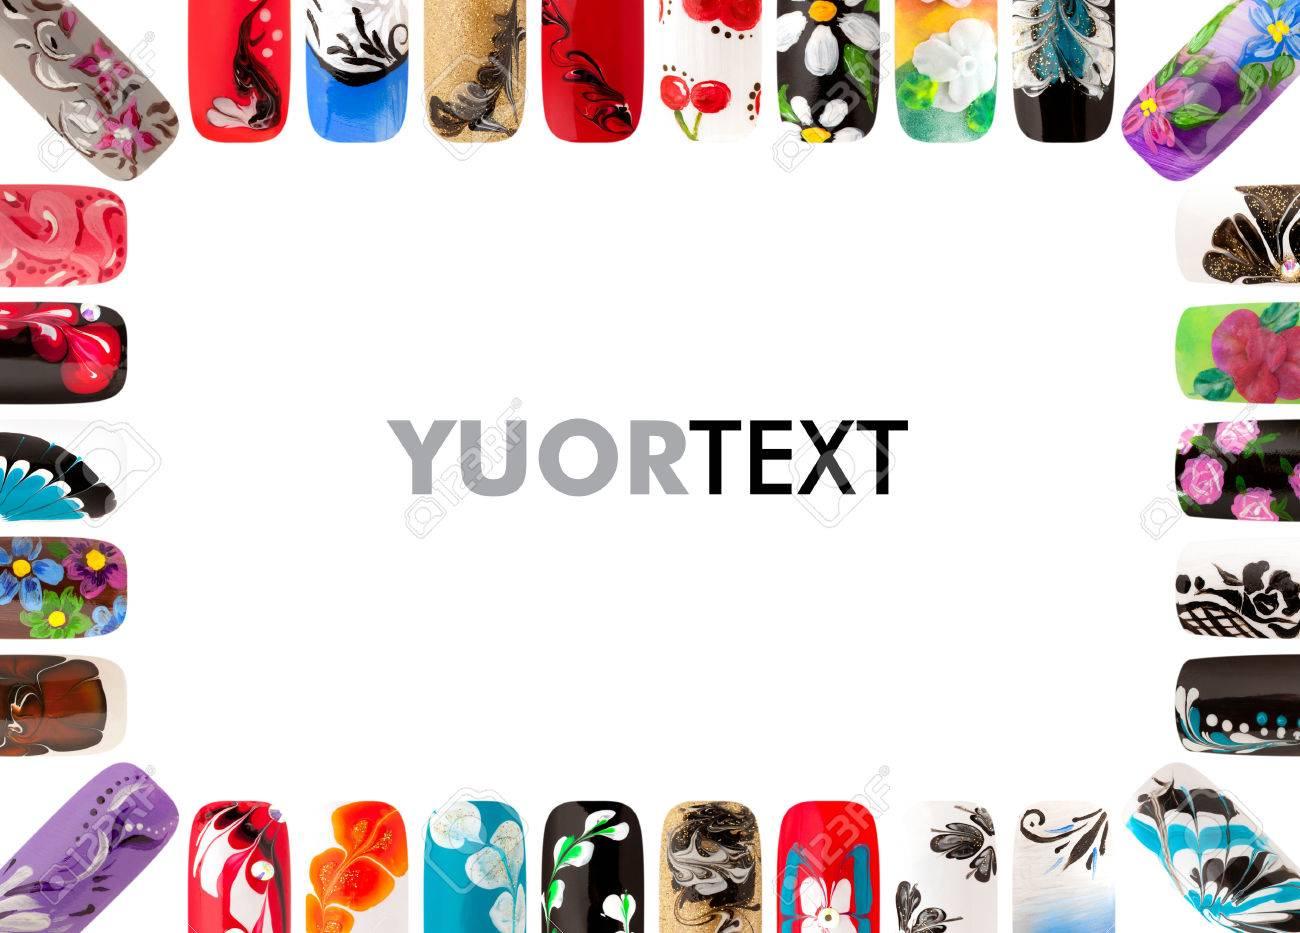 Nail art handmade. Colorful nails isolated - 39504481